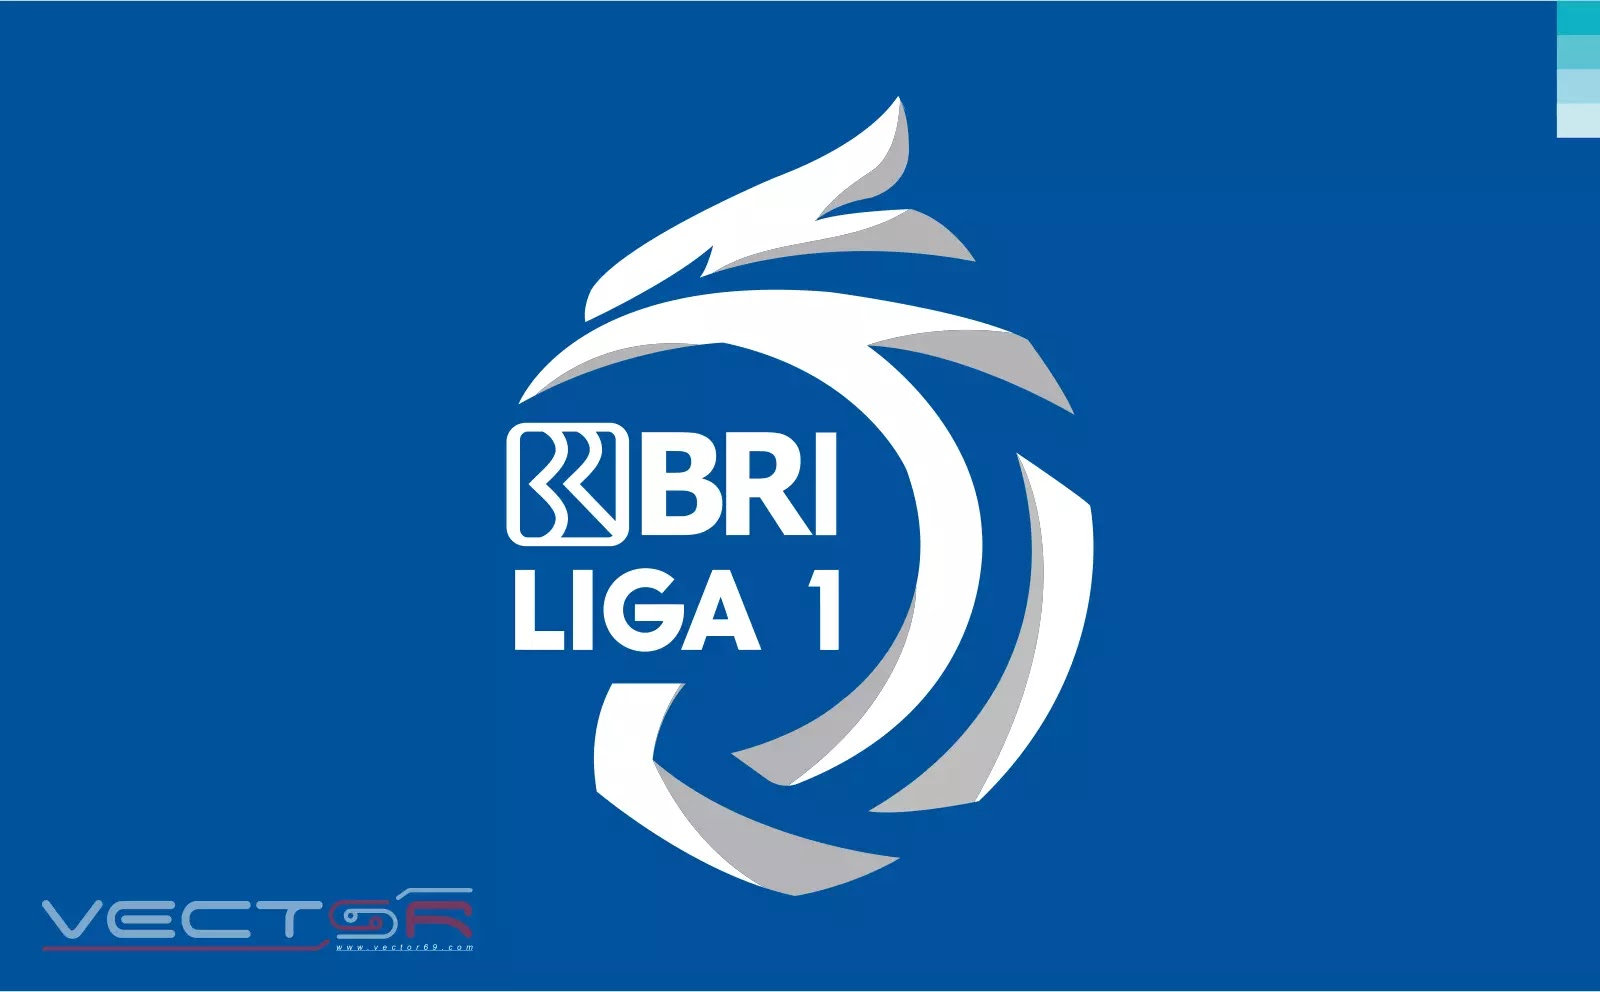 BRI Liga 1 Indonesia Logo - Download Vector File SVG (Scalable Vector Graphics)